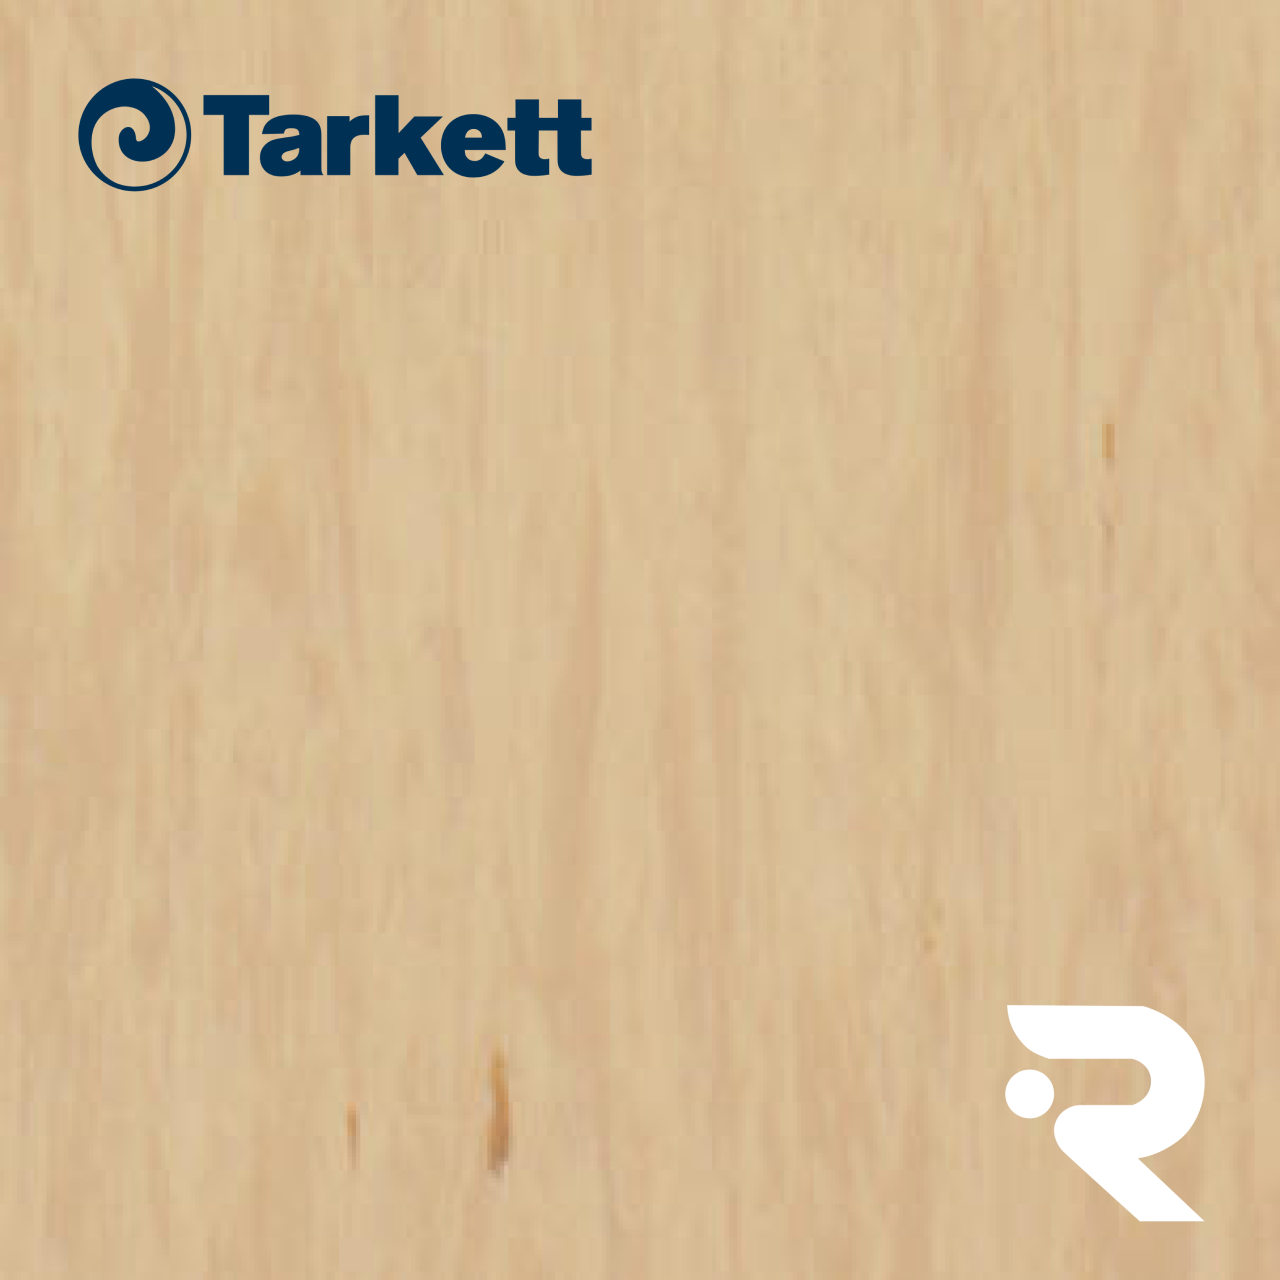 🏫 Гомогенный линолеум Tarkett   Standard SANDSTONE 0484   Standard Plus 2.0 mm   2 х 23 м